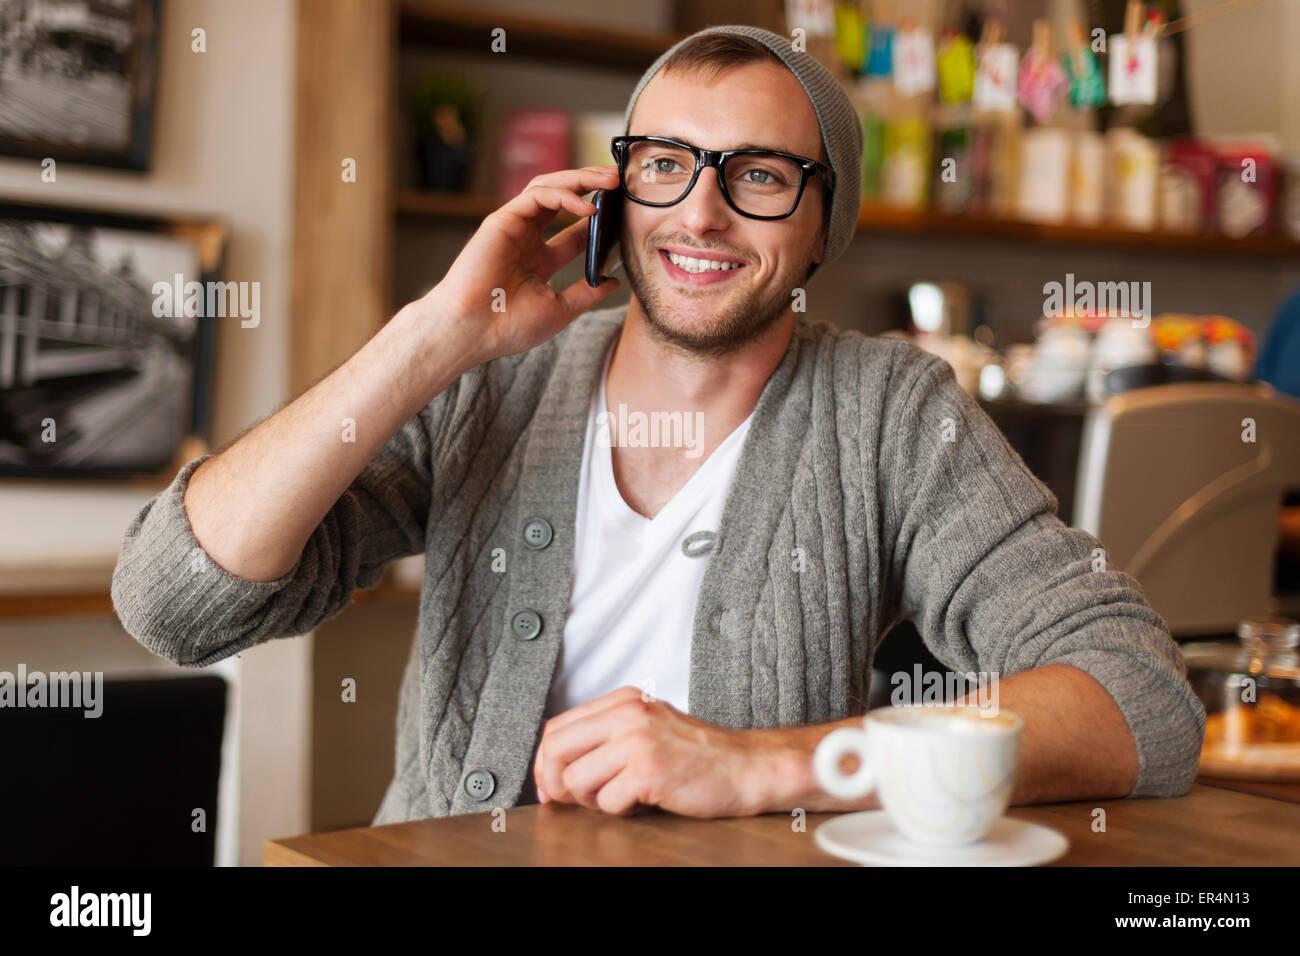 Hipster-Mann im Gespräch mit dem Handy im Café. Krakau, Polen Stockbild